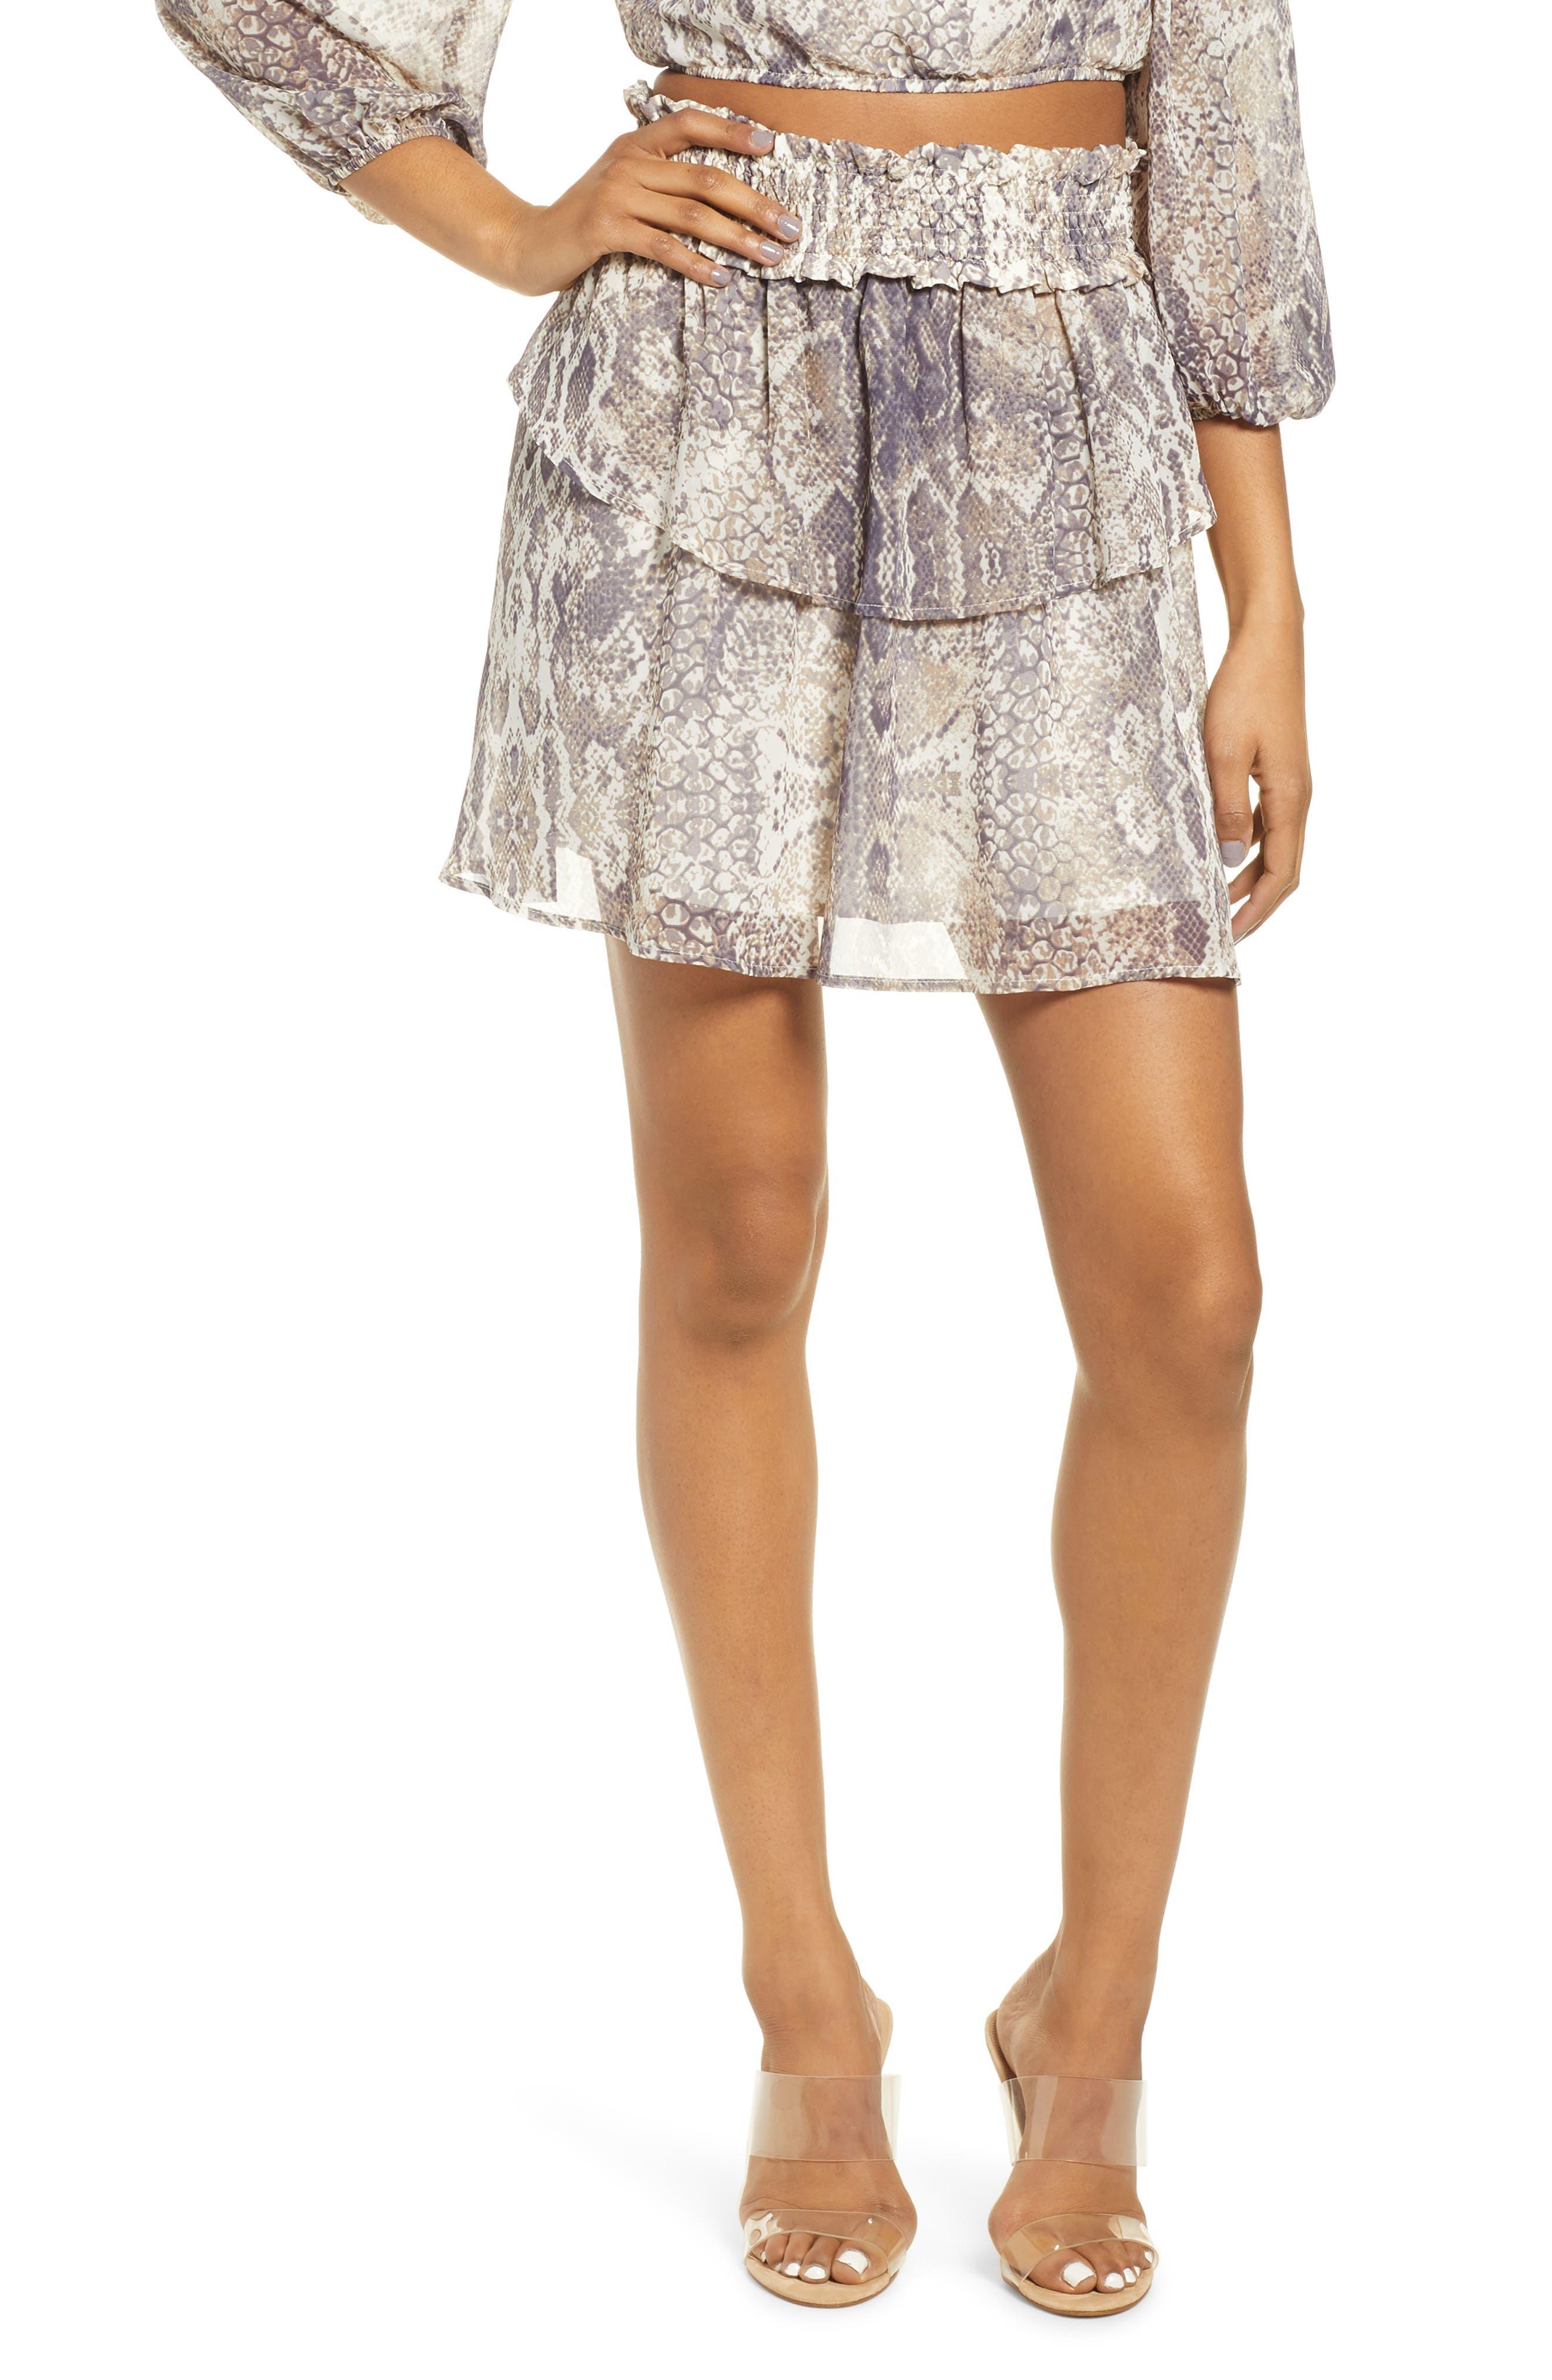 4Si3Nna Smocked Snakeskin Print Tiered Miniskirt, Beige